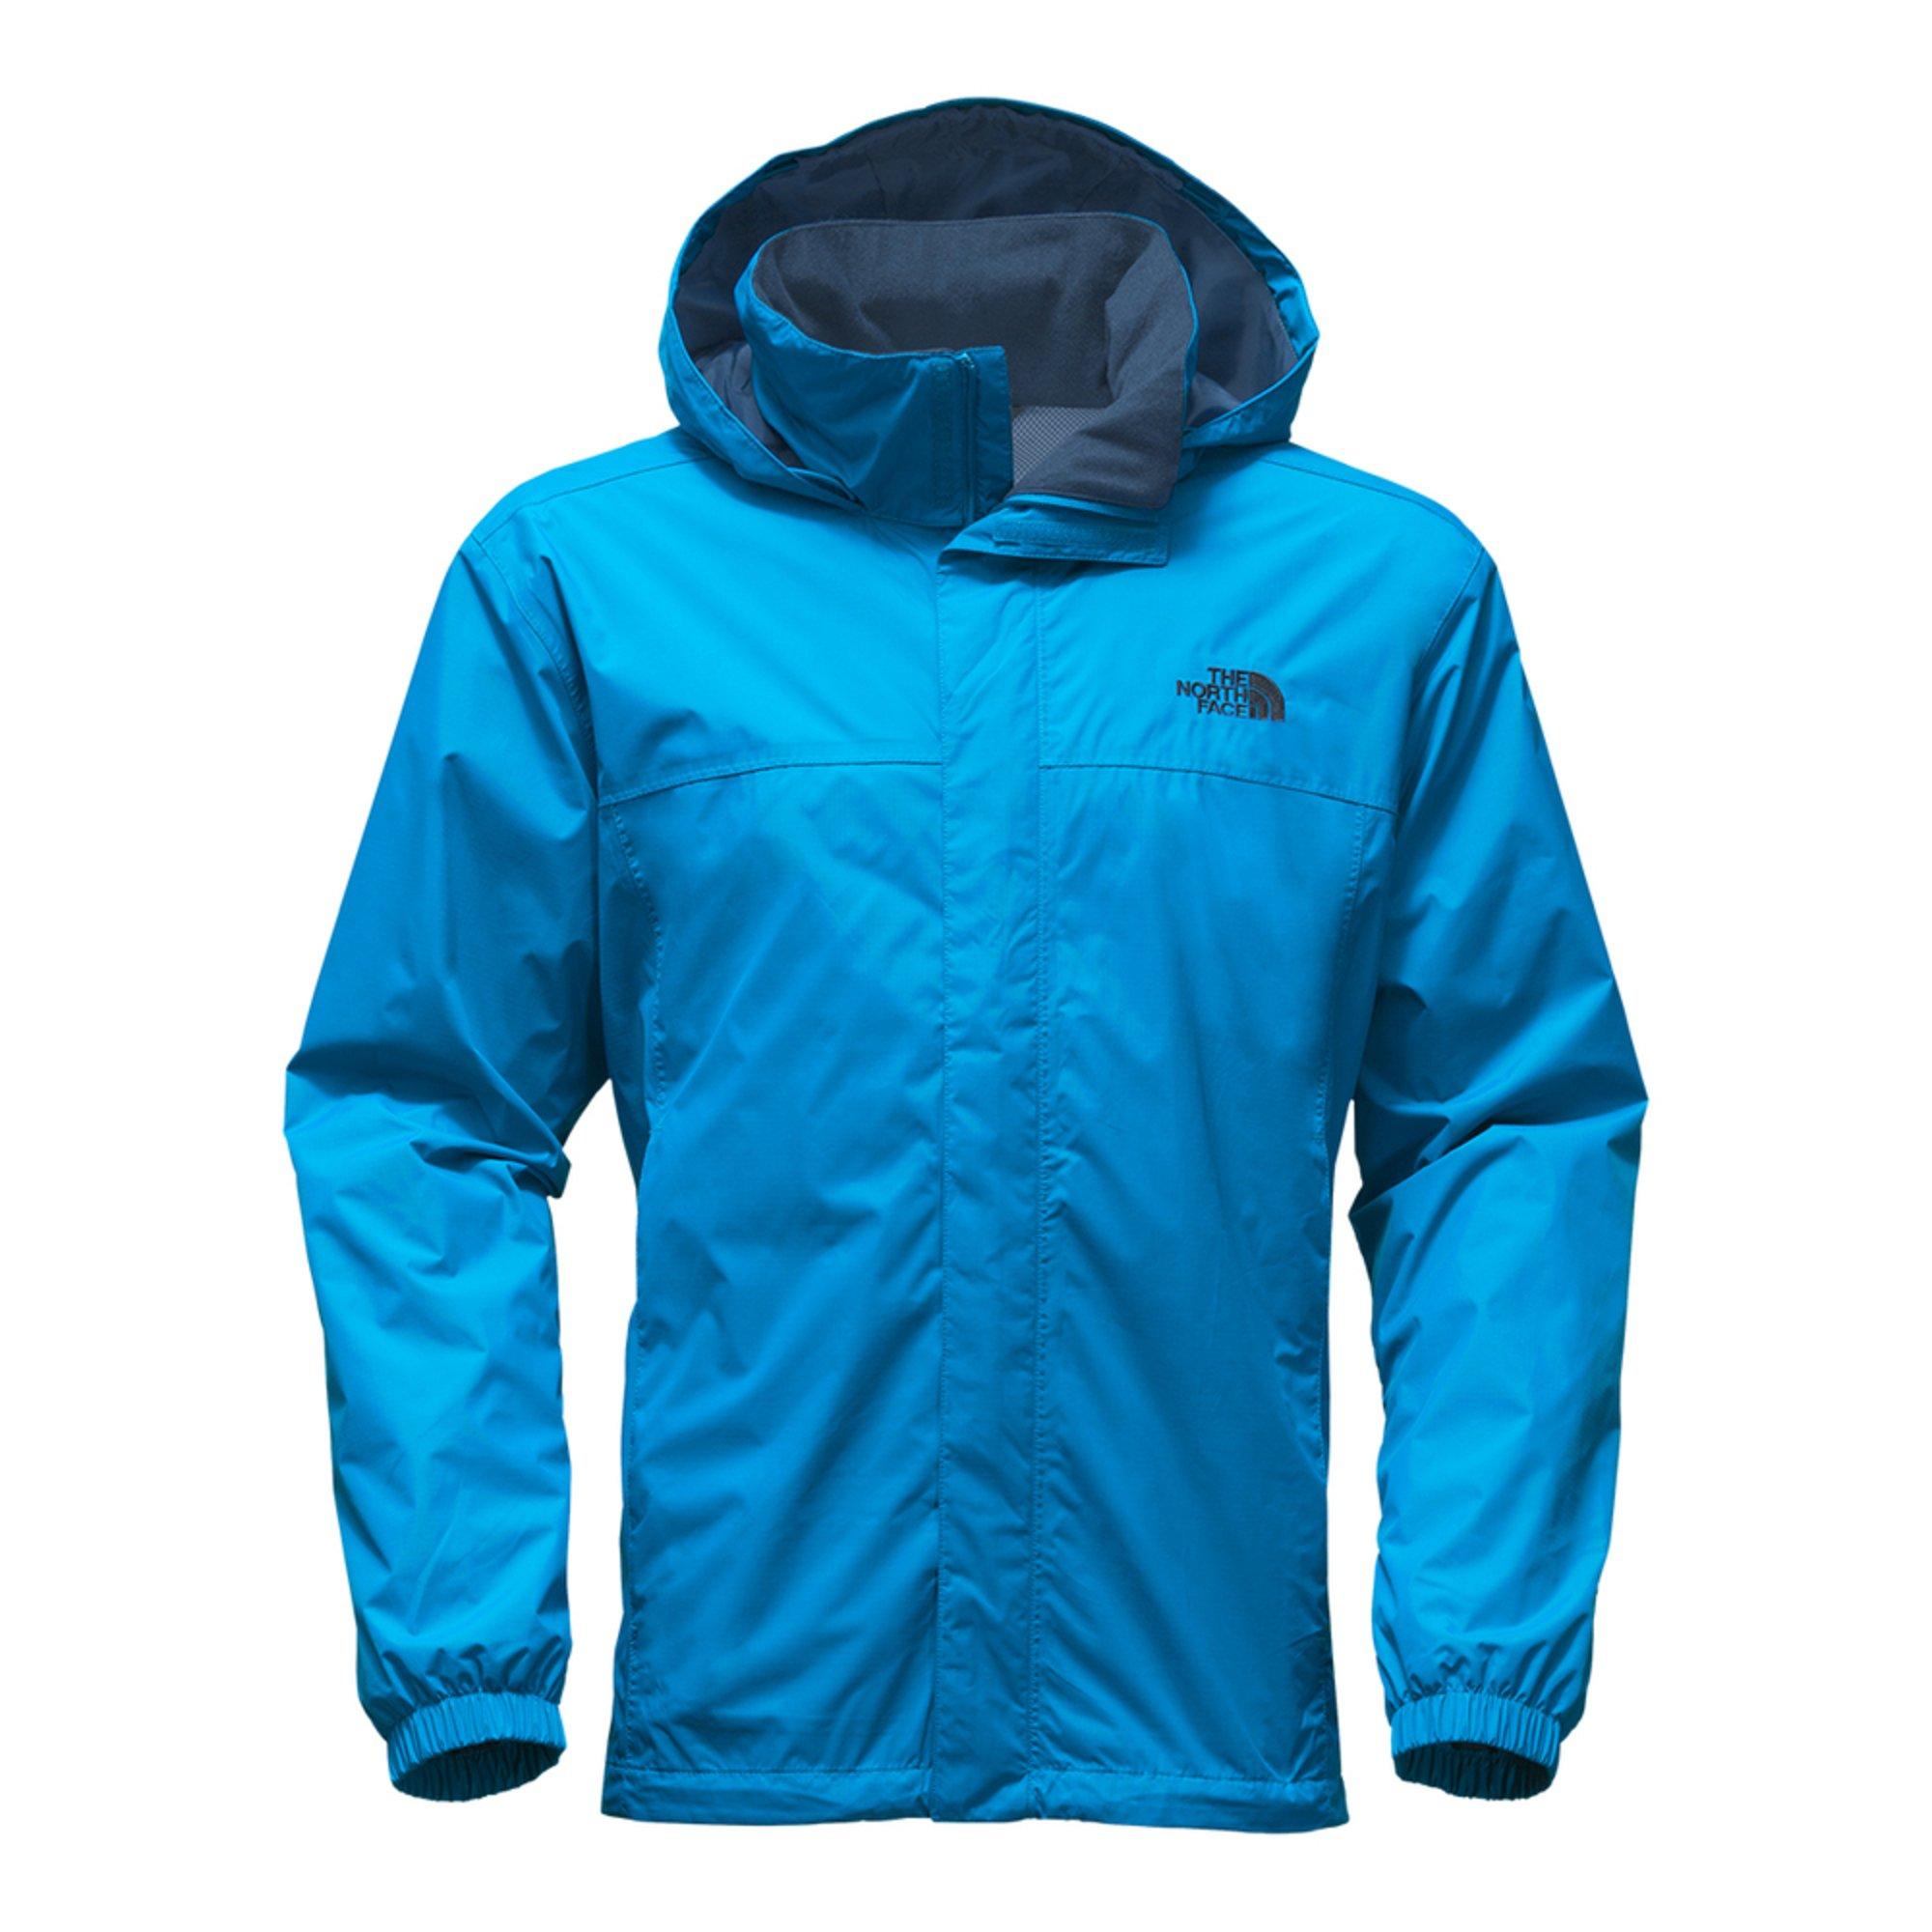 The North Face Men S Resolve 2 Jacket Hyper Blue Men S